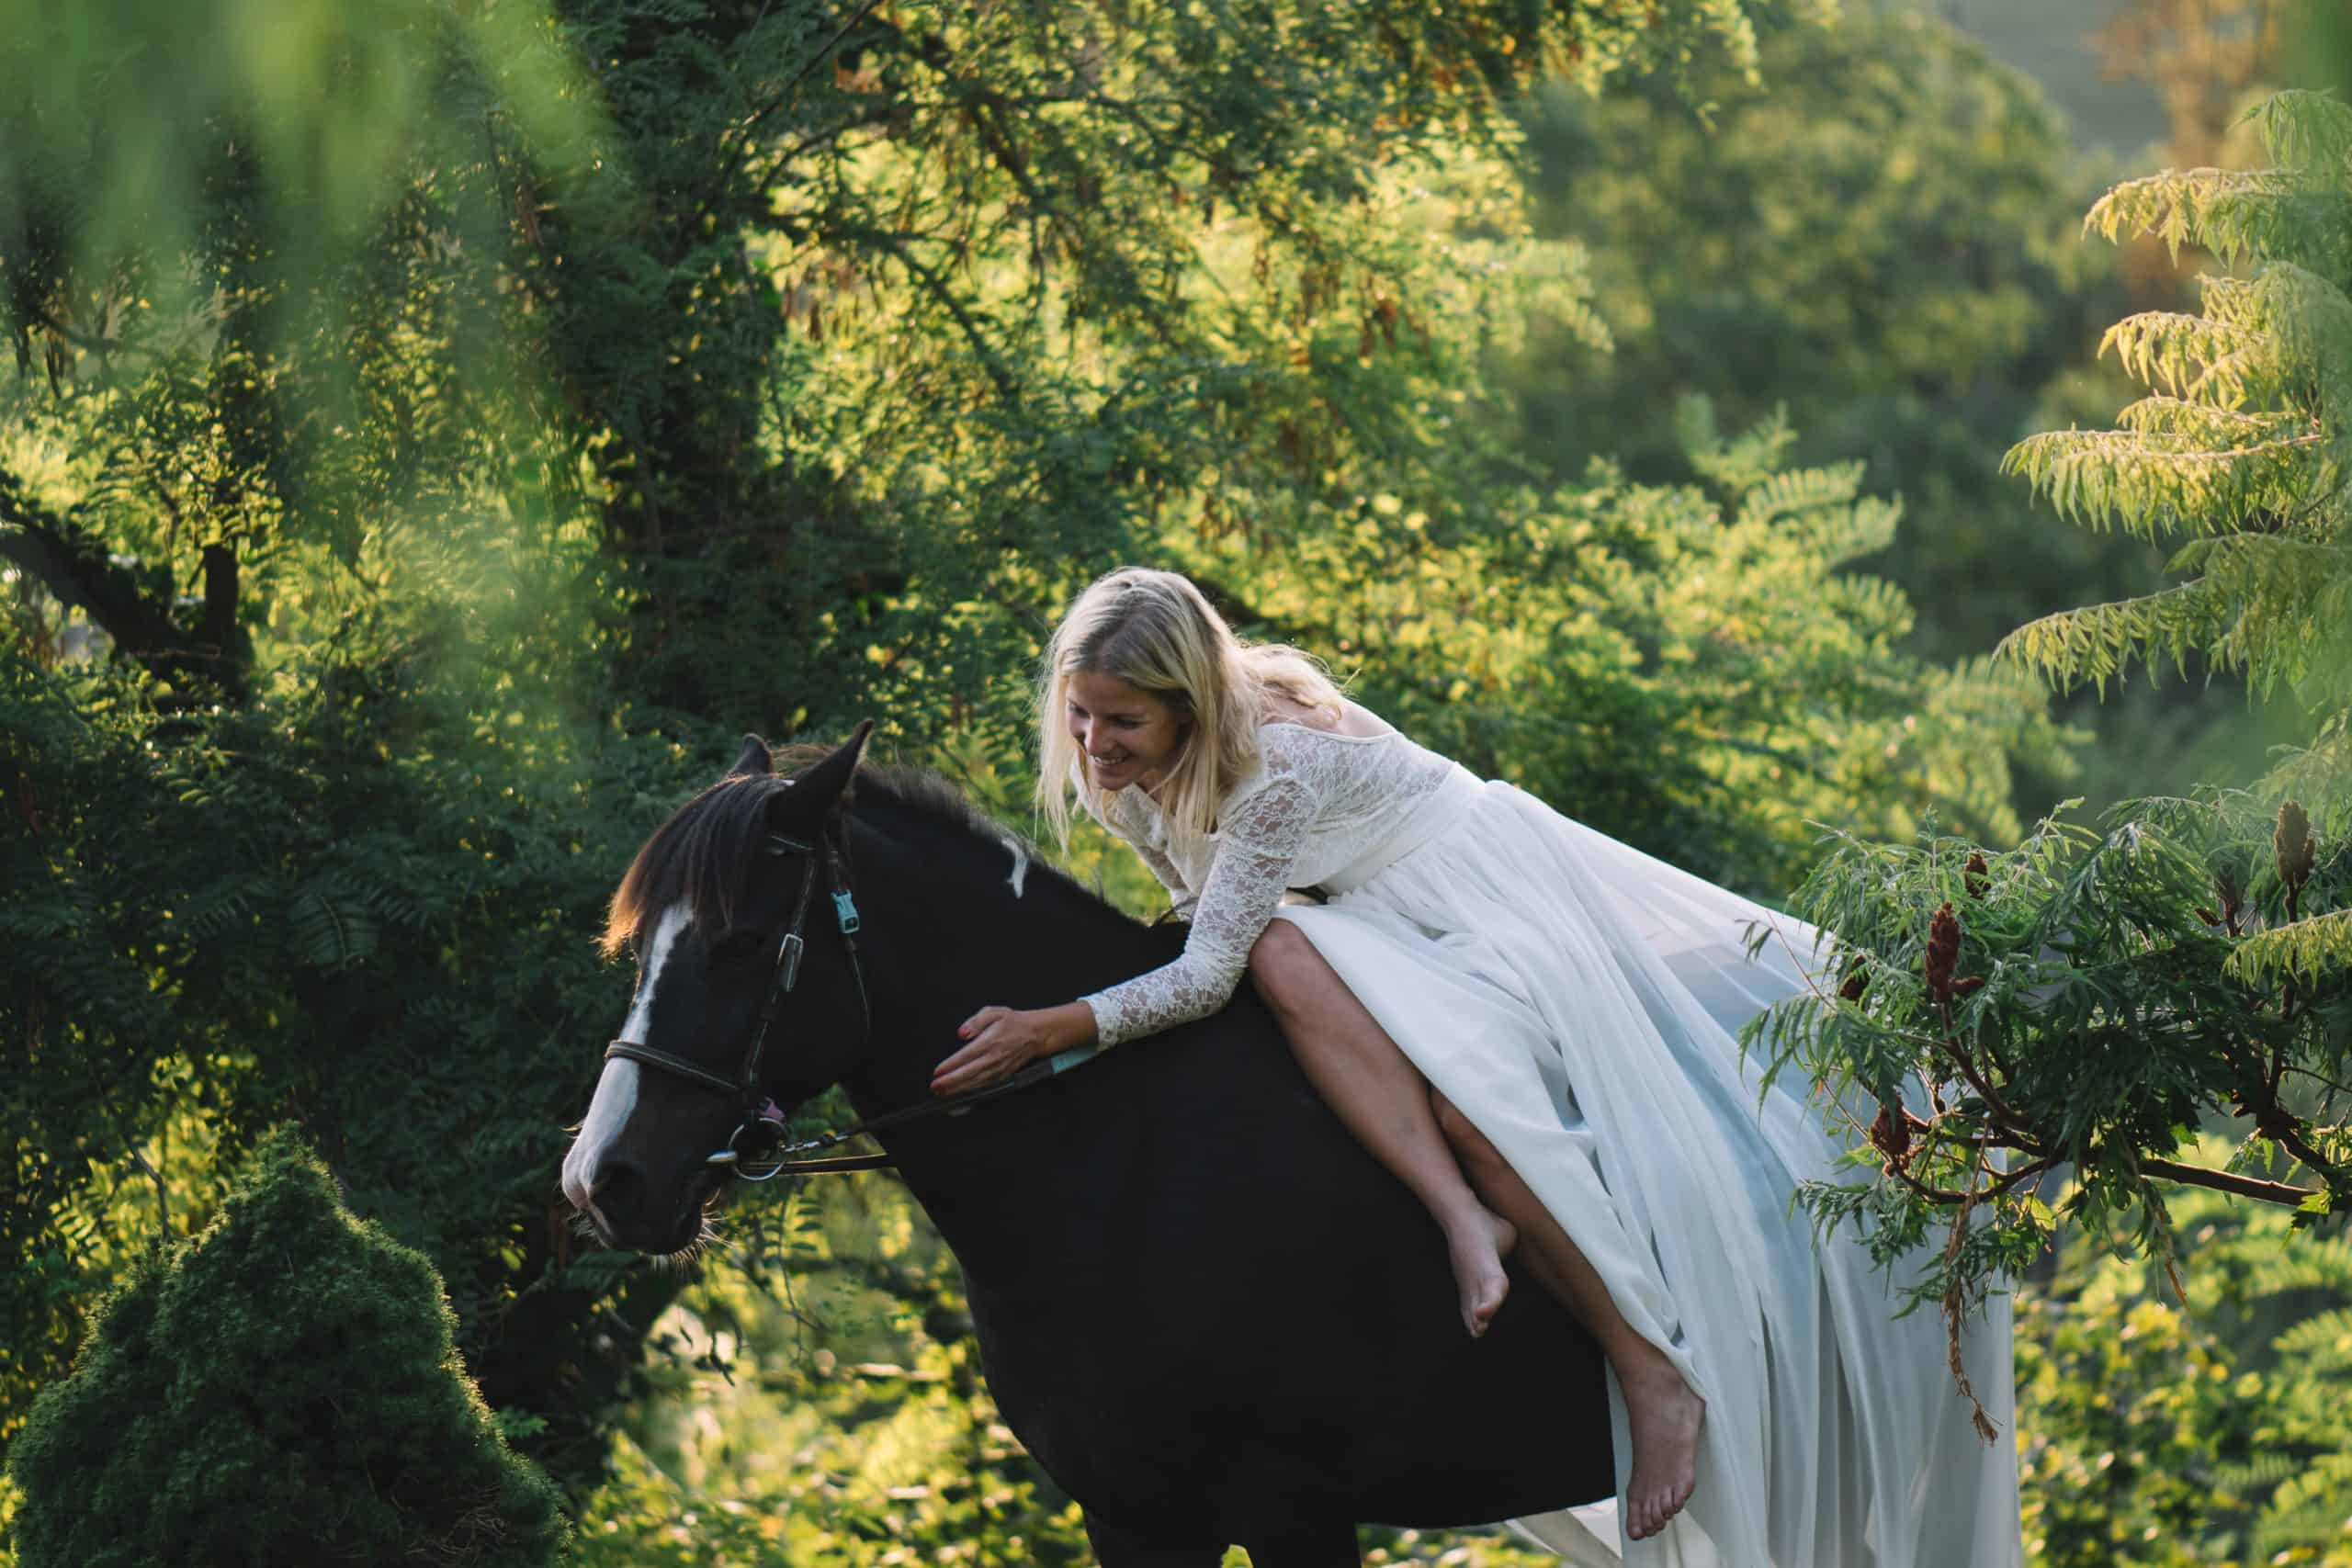 Wedding concept, bride on horse